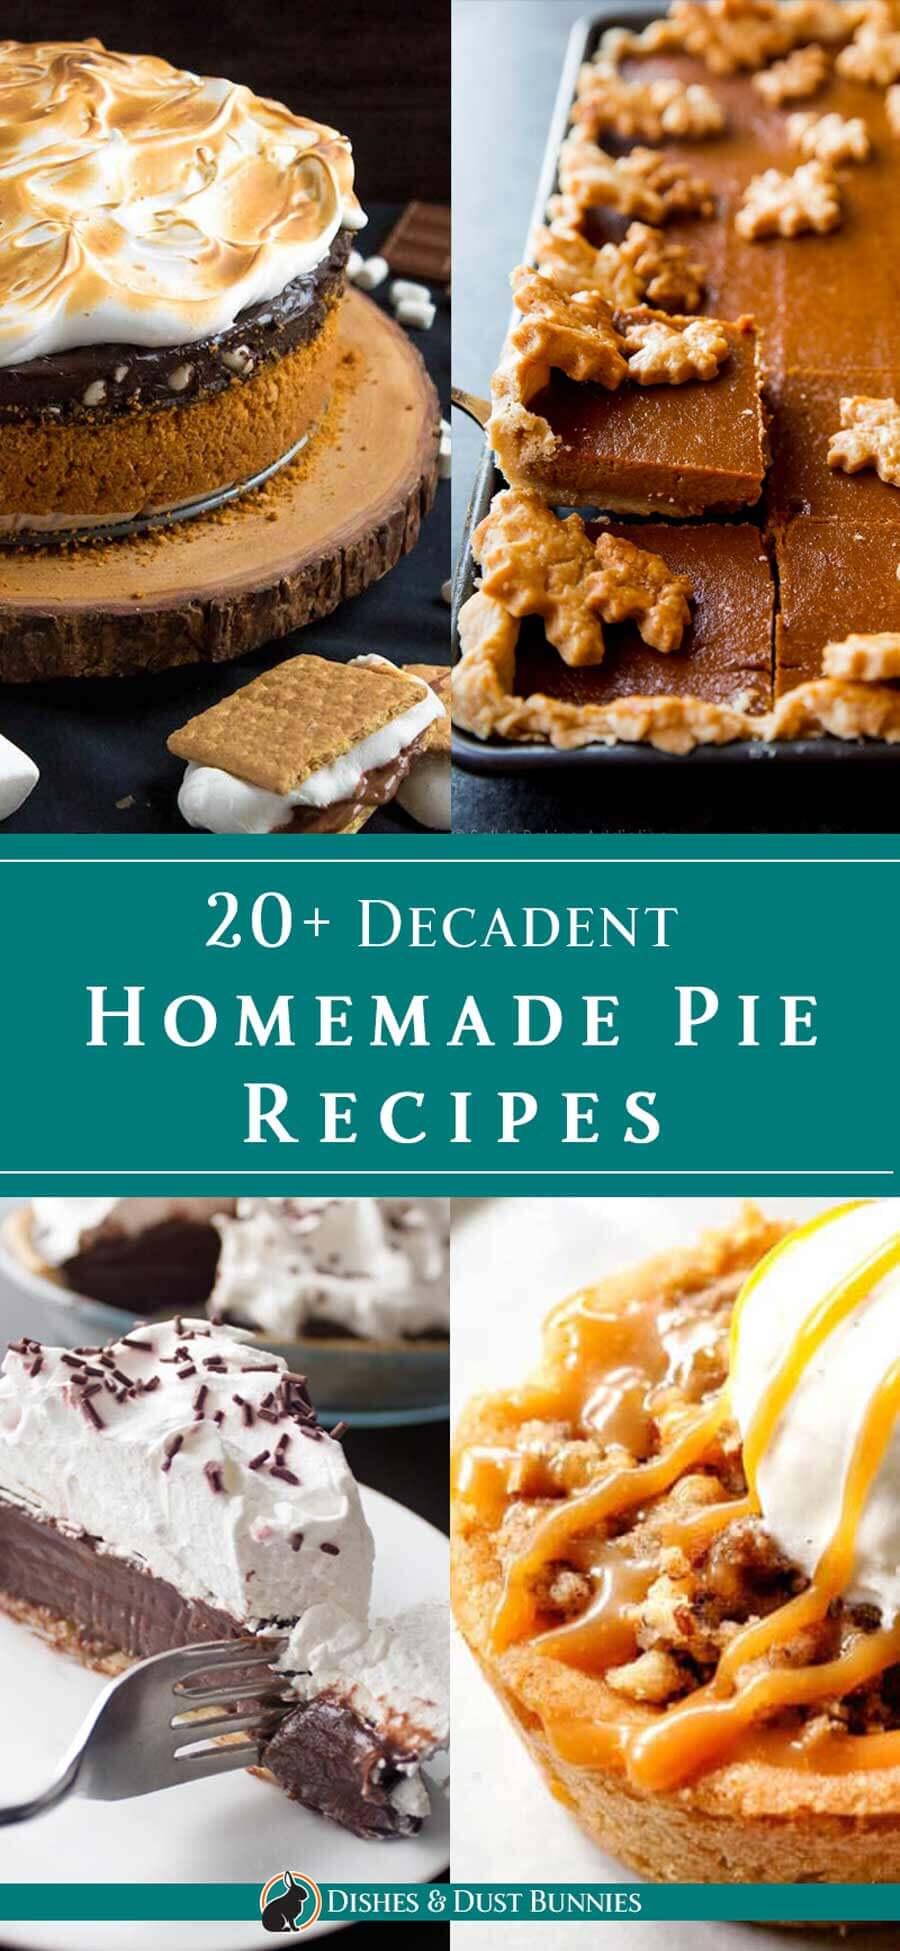 20+ Decadent Homemade Pie Recipes via @mvdustbunnies